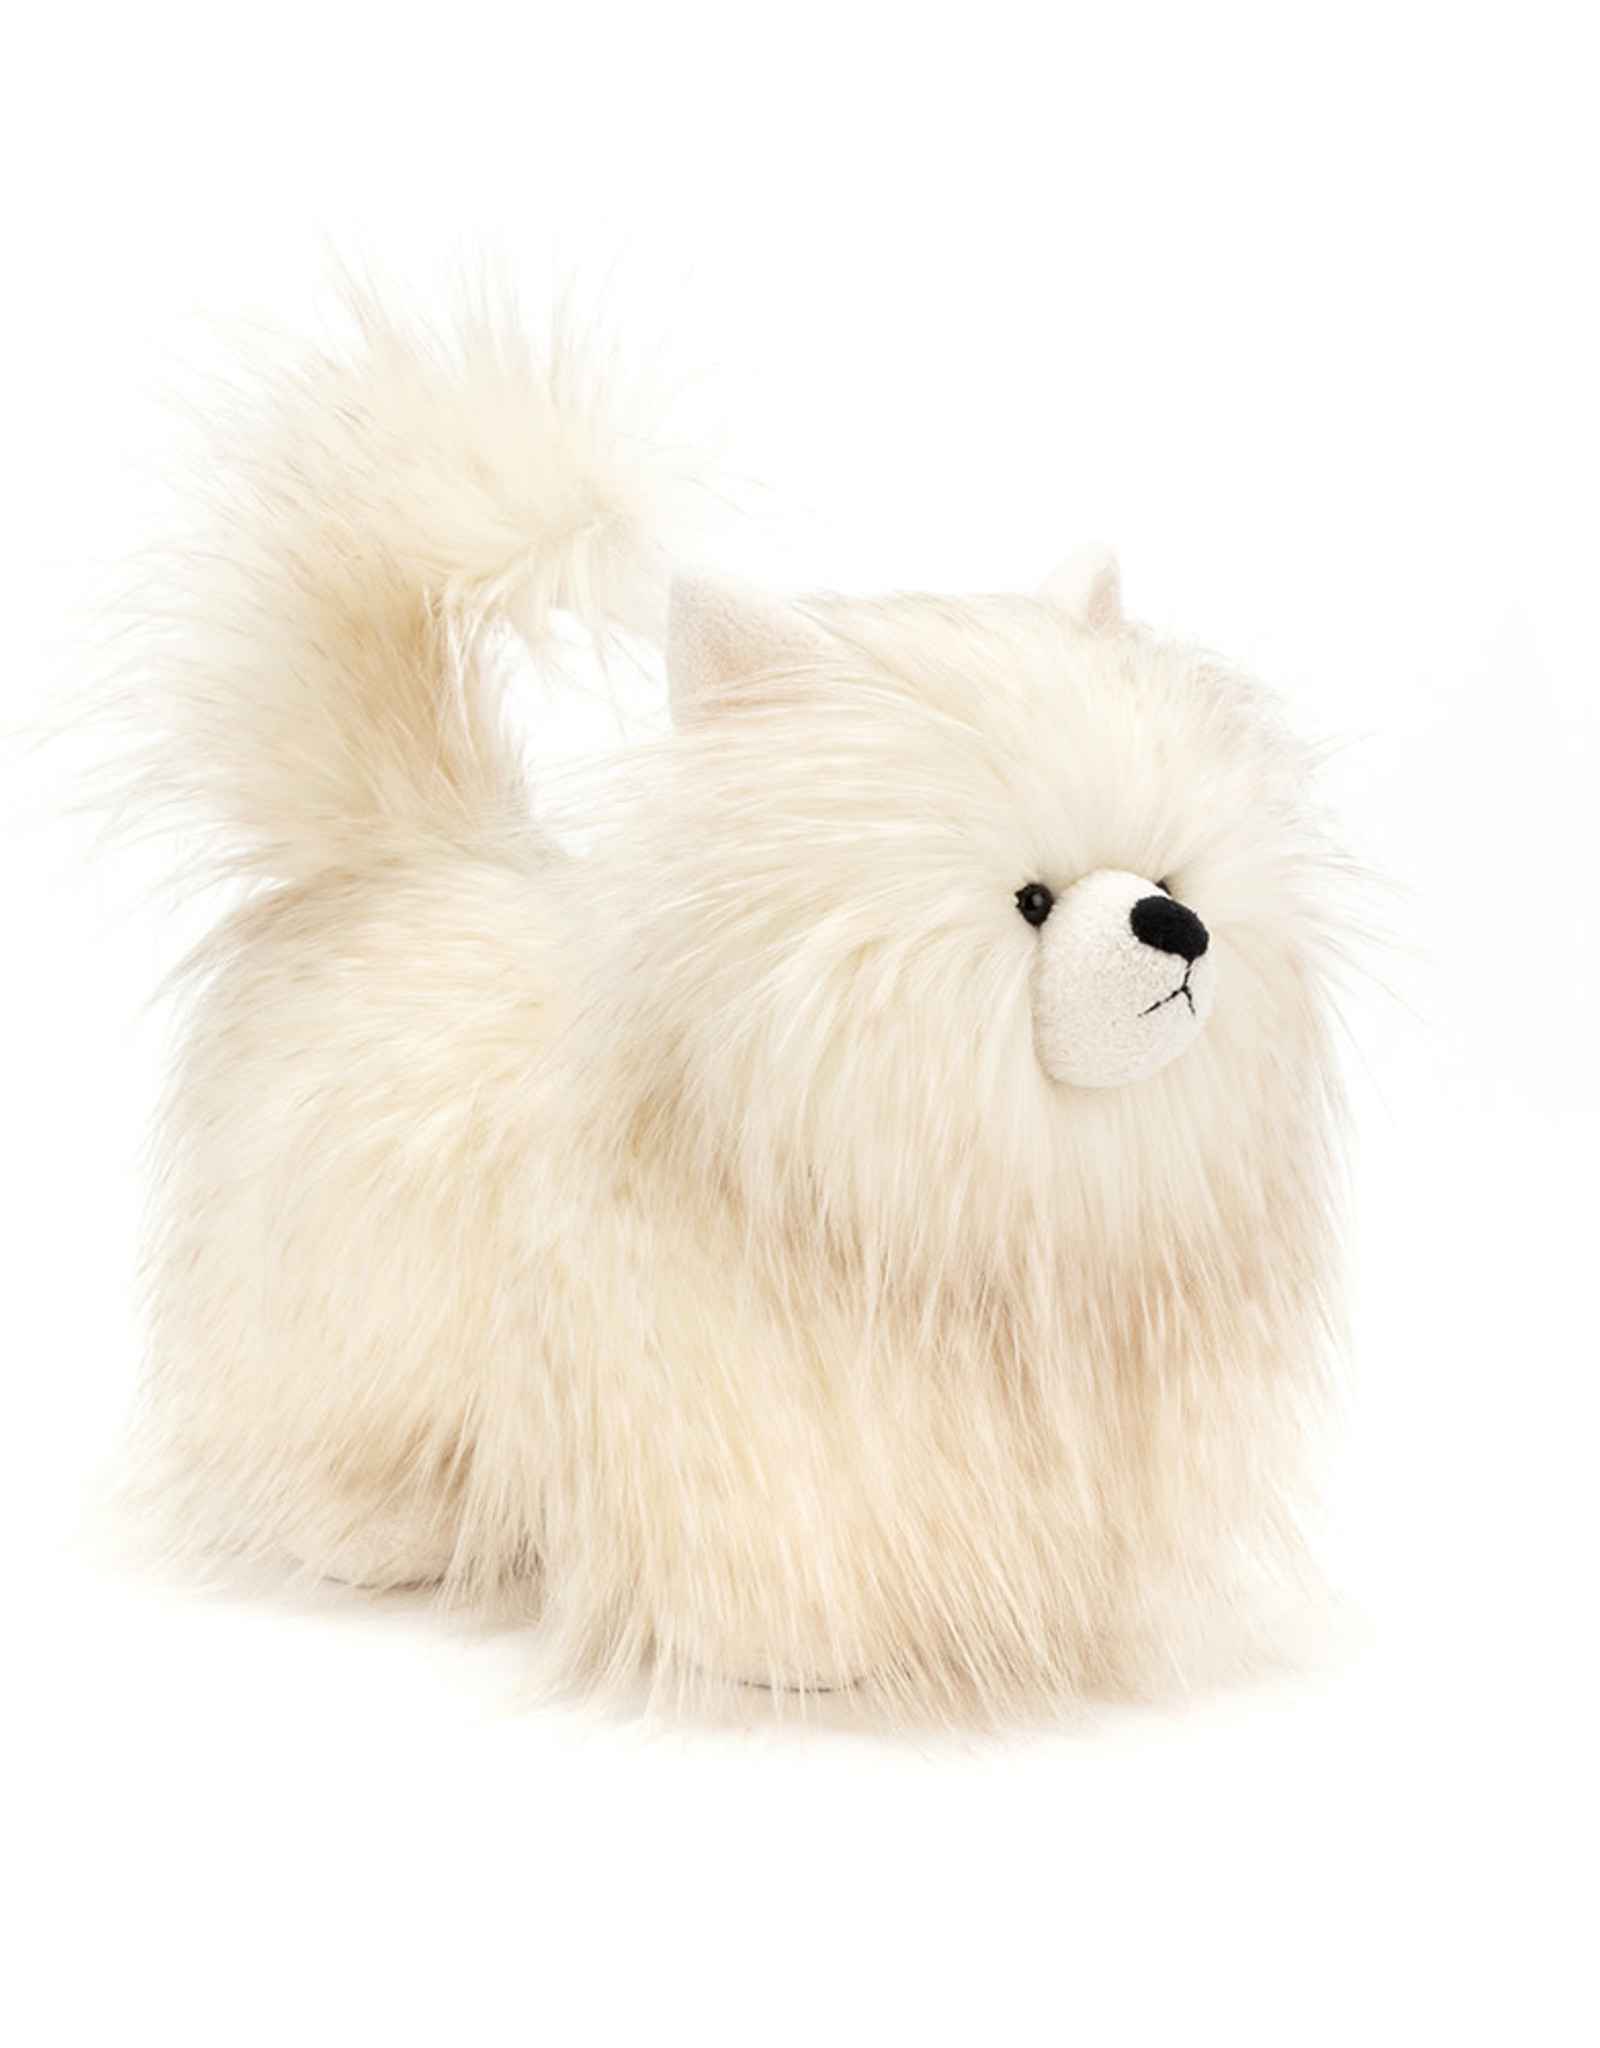 Jellycat Precious Patsy Pup, cream